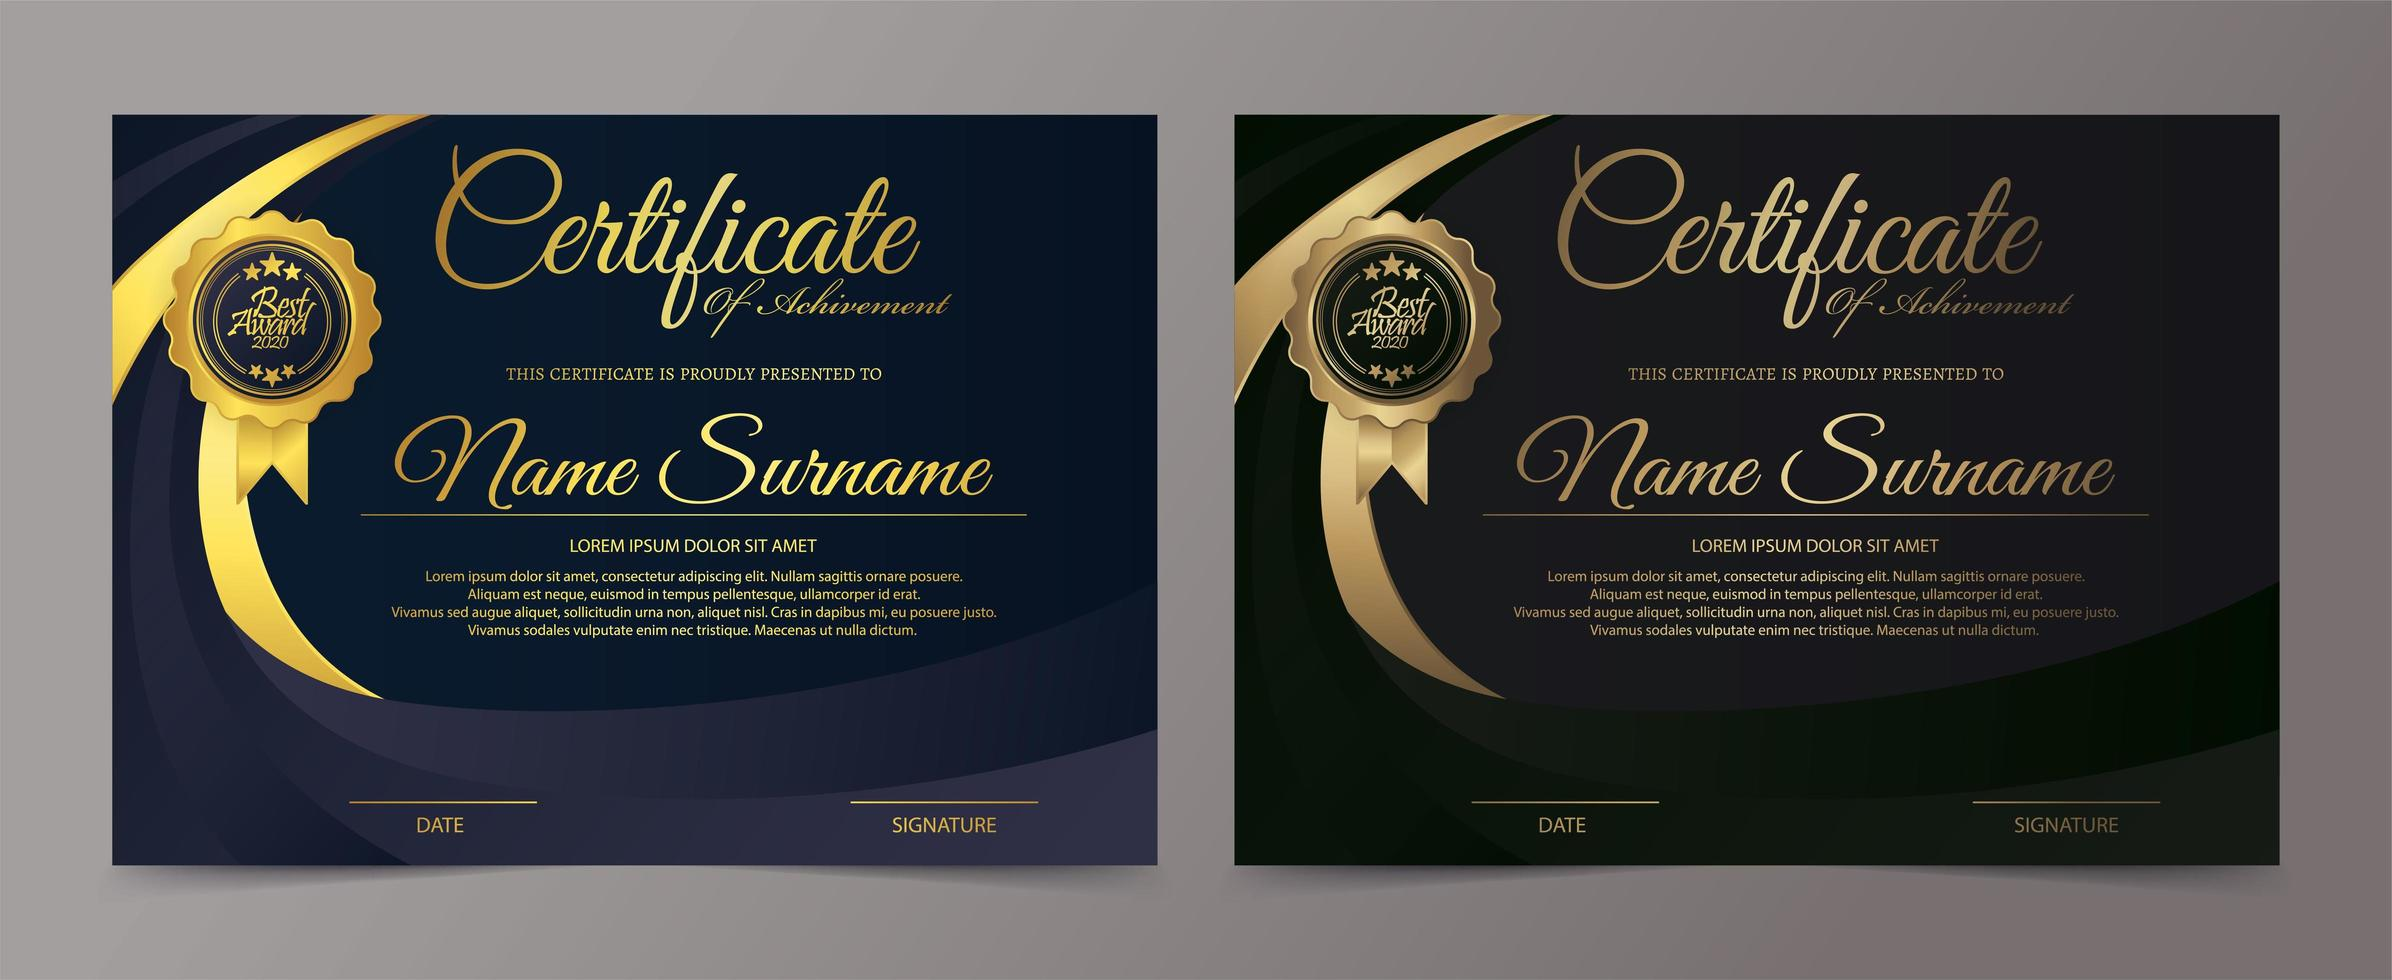 conjunto de modelo de certificado preto e dourado vetor